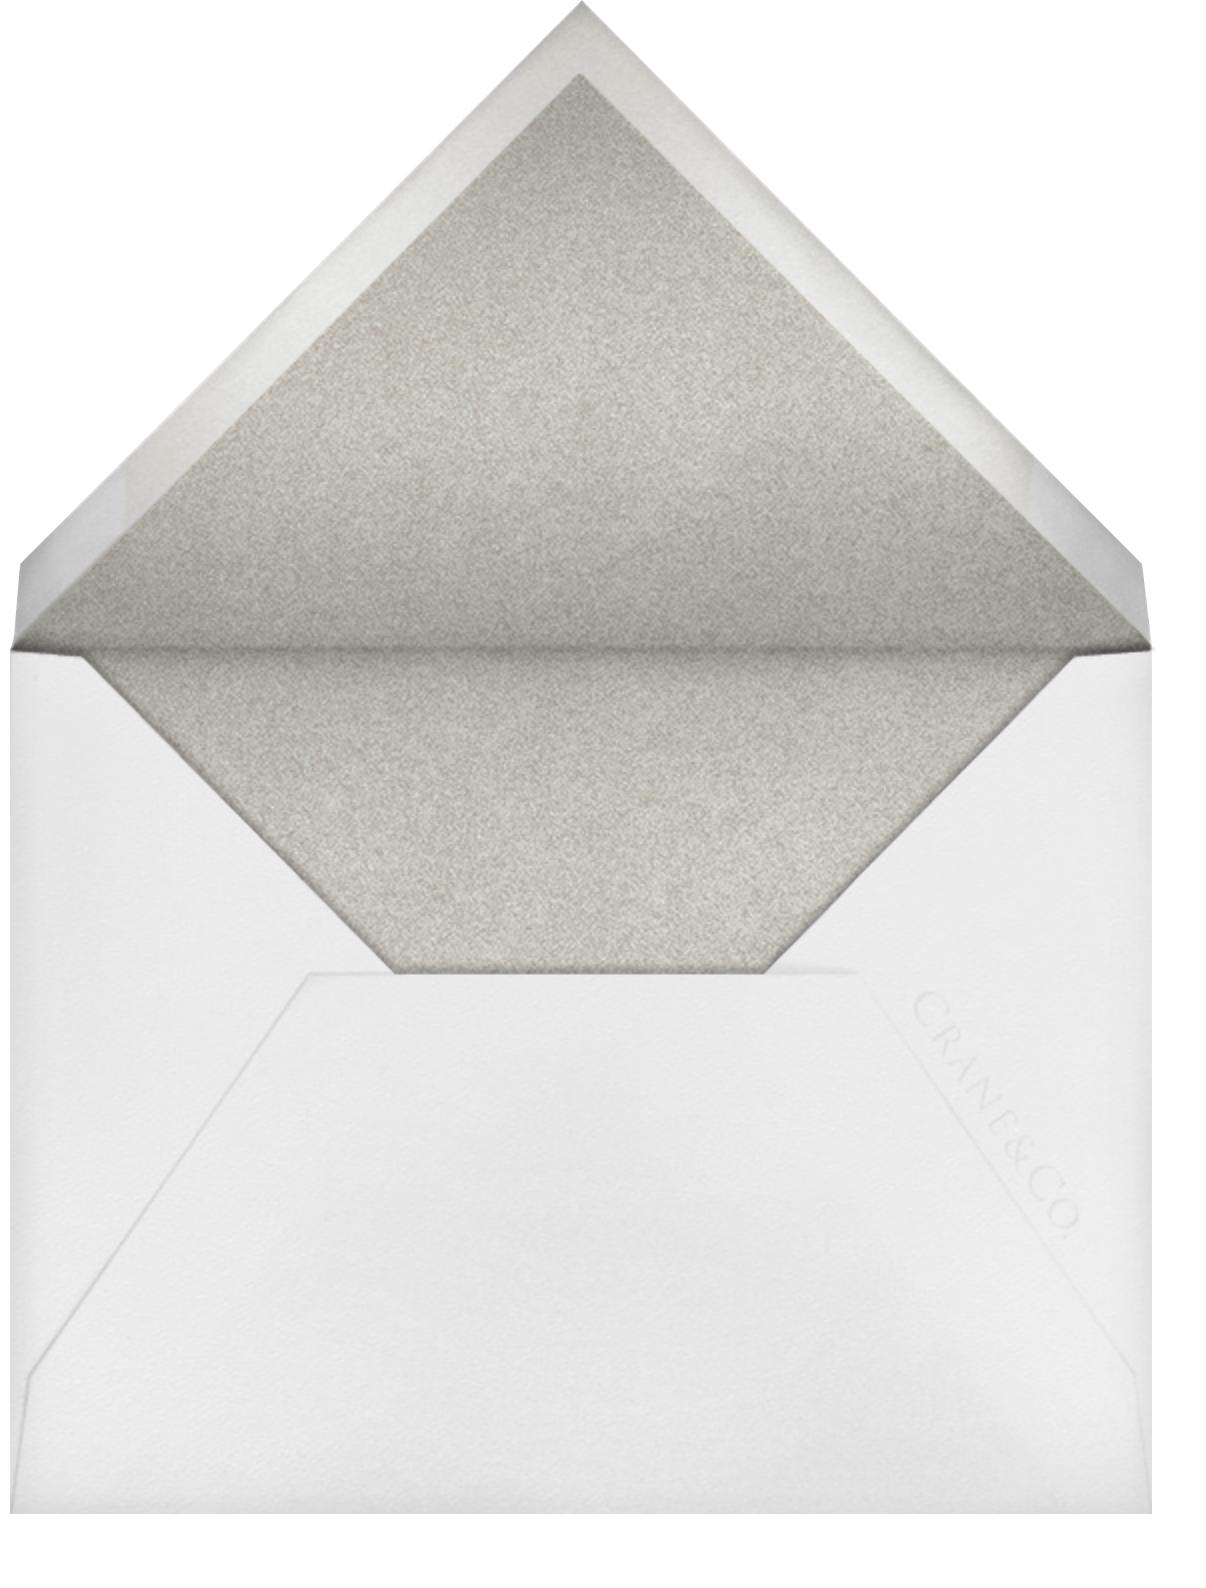 Floral Trellis I - Regent Blue - Oscar de la Renta - Bat and bar mitzvah - envelope back